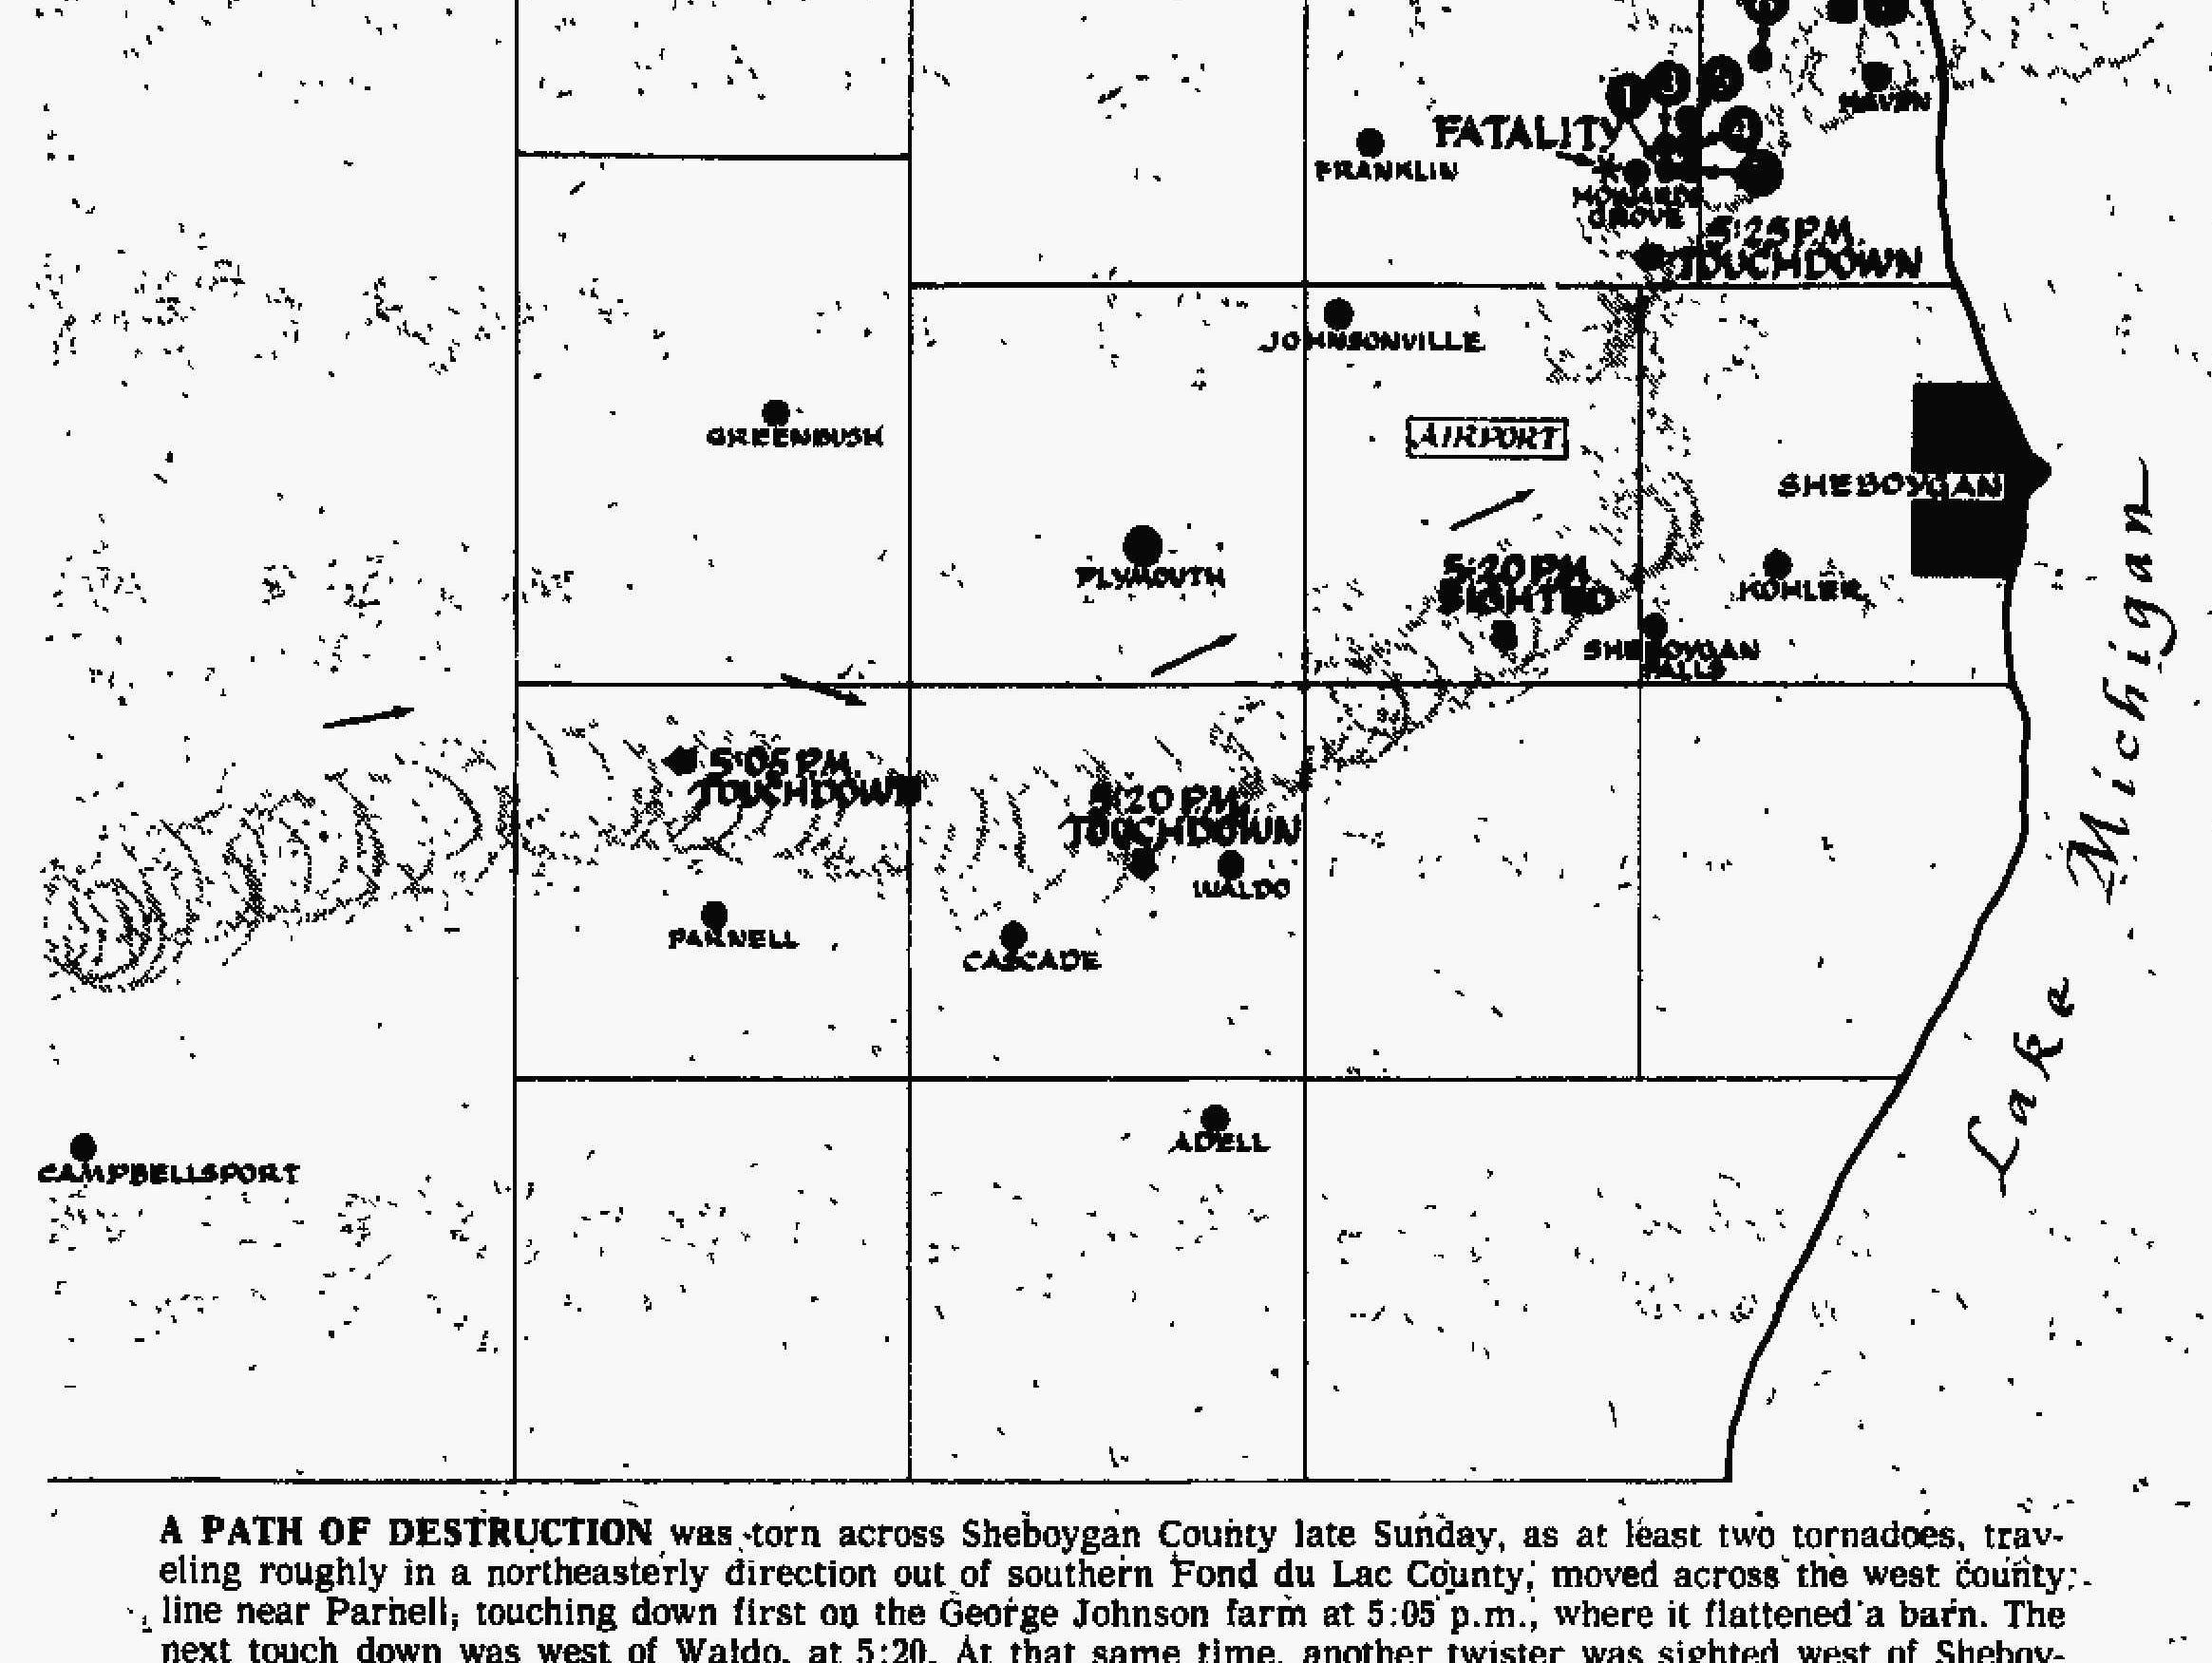 sheboygan county history reveals deadly tornados